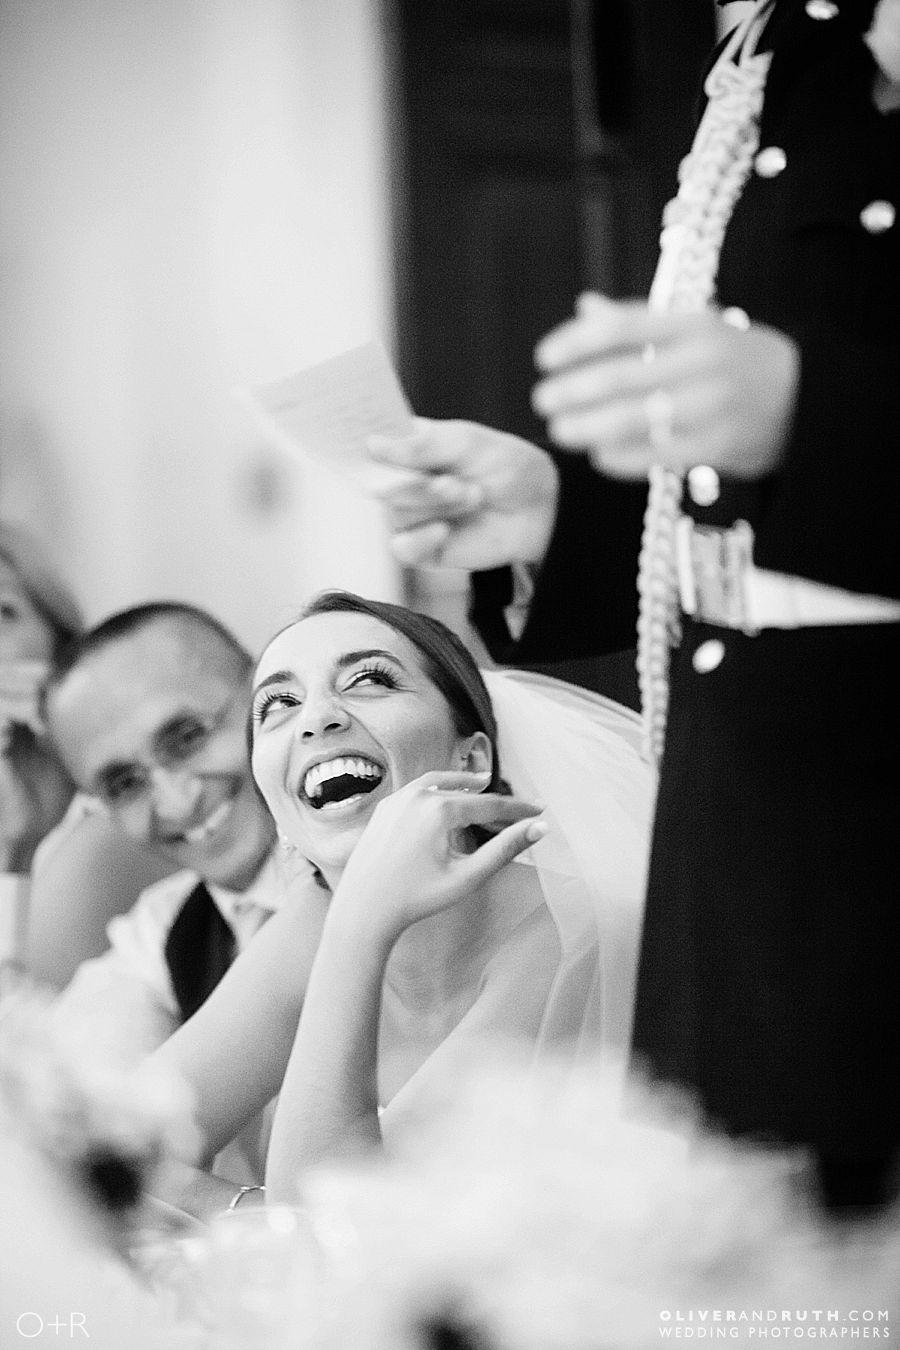 Bride laughing during groom's wedding speech at Llansantffraed Court